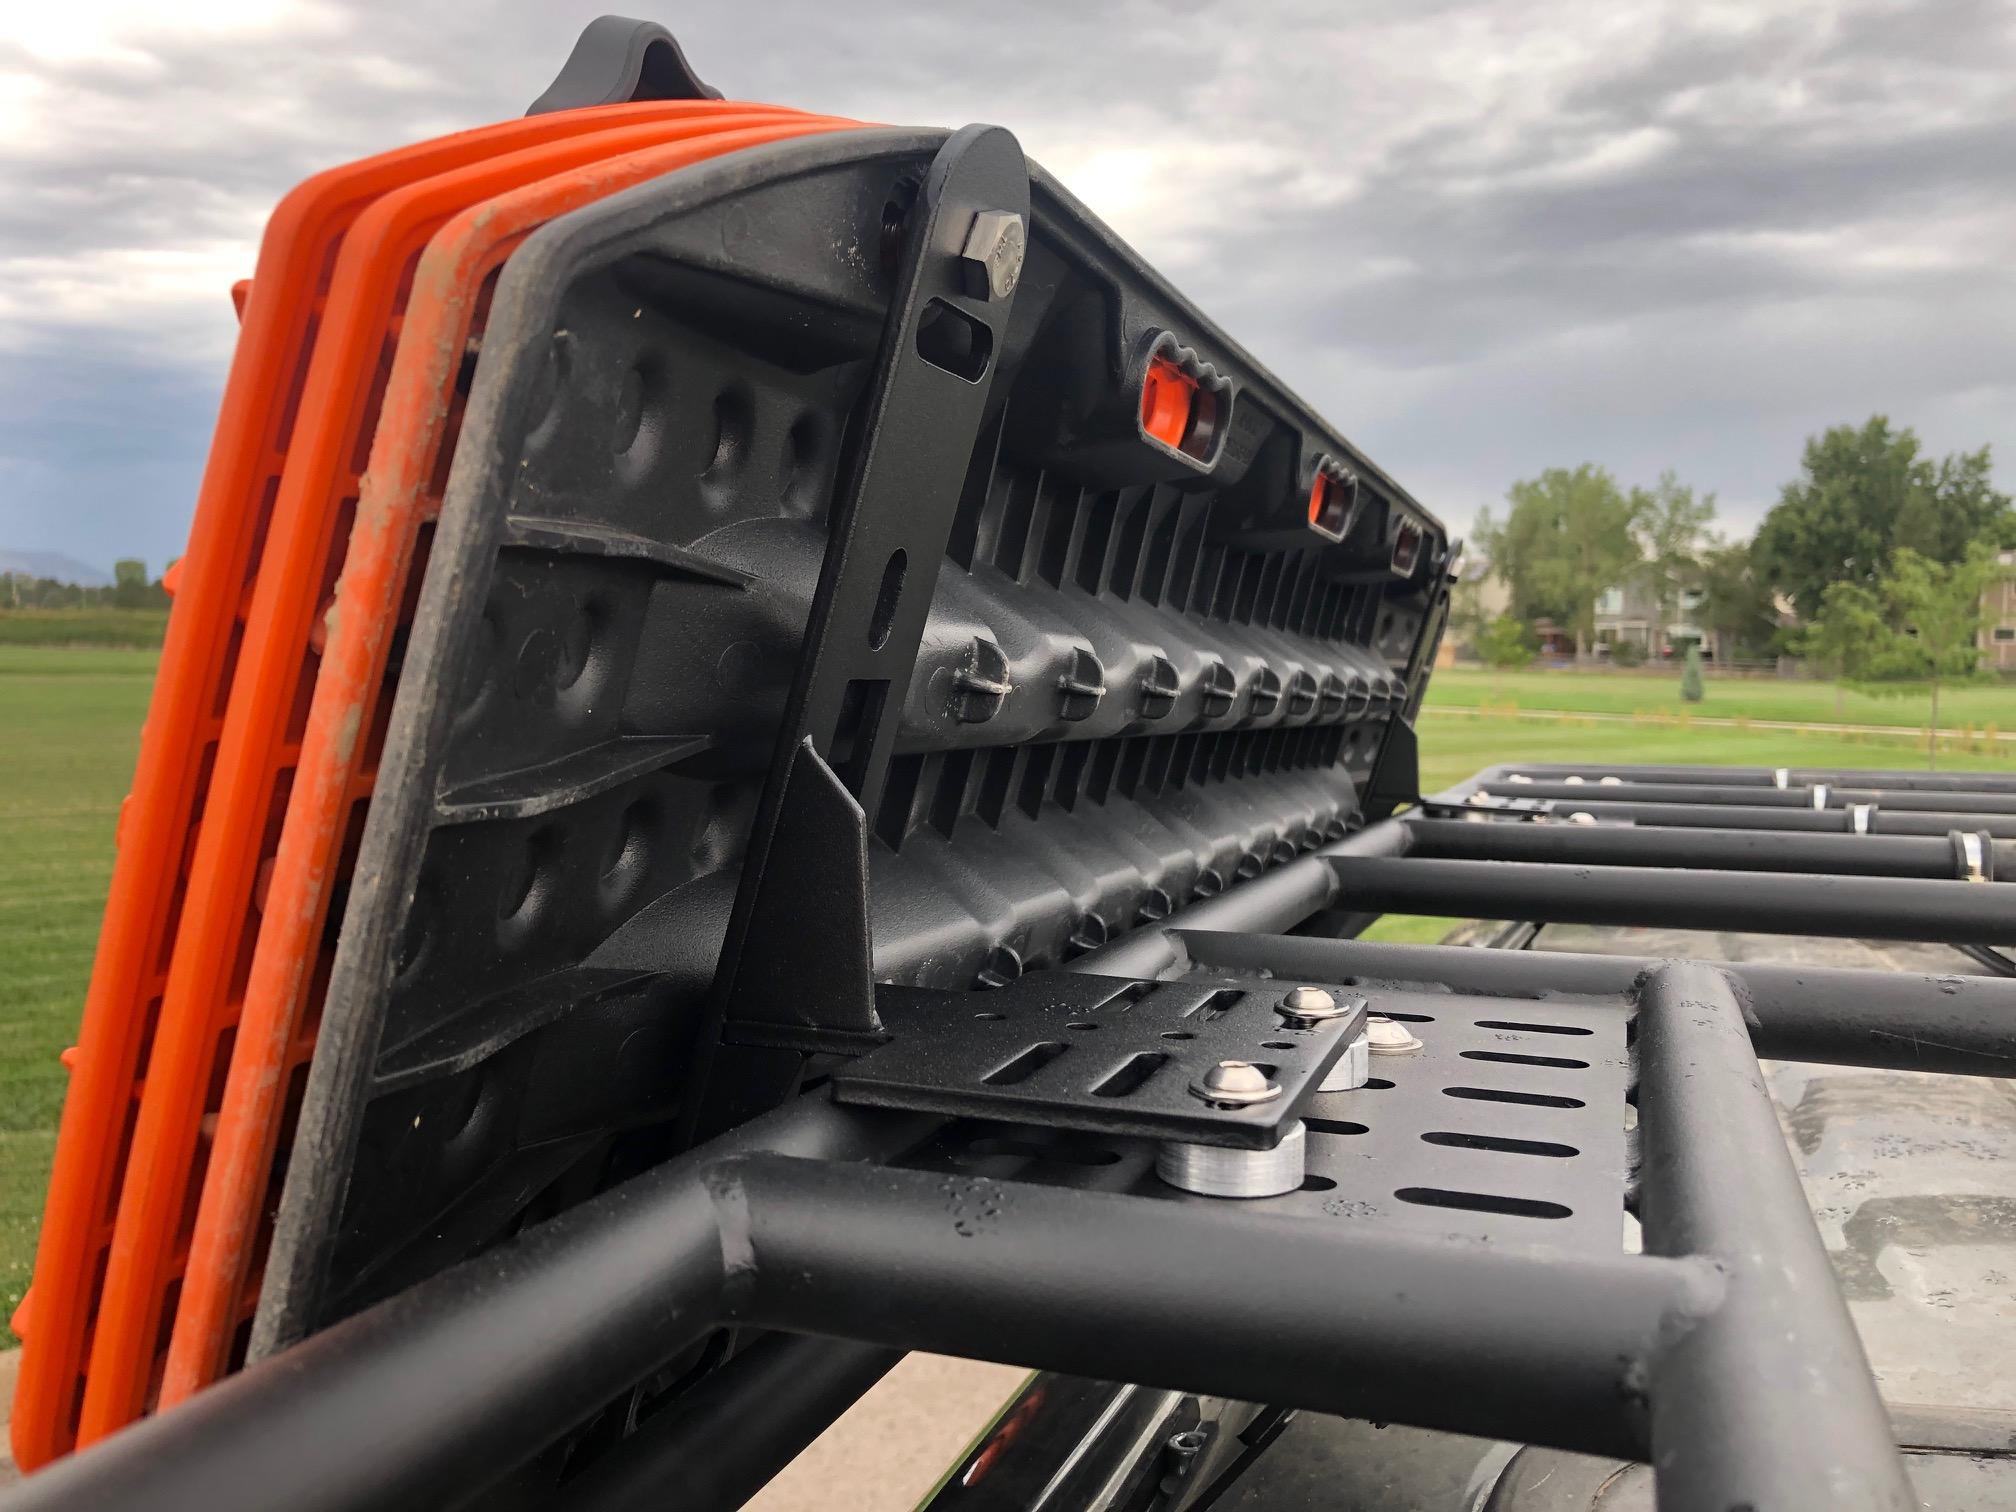 Maxtrax side mount on Gamiviti rack